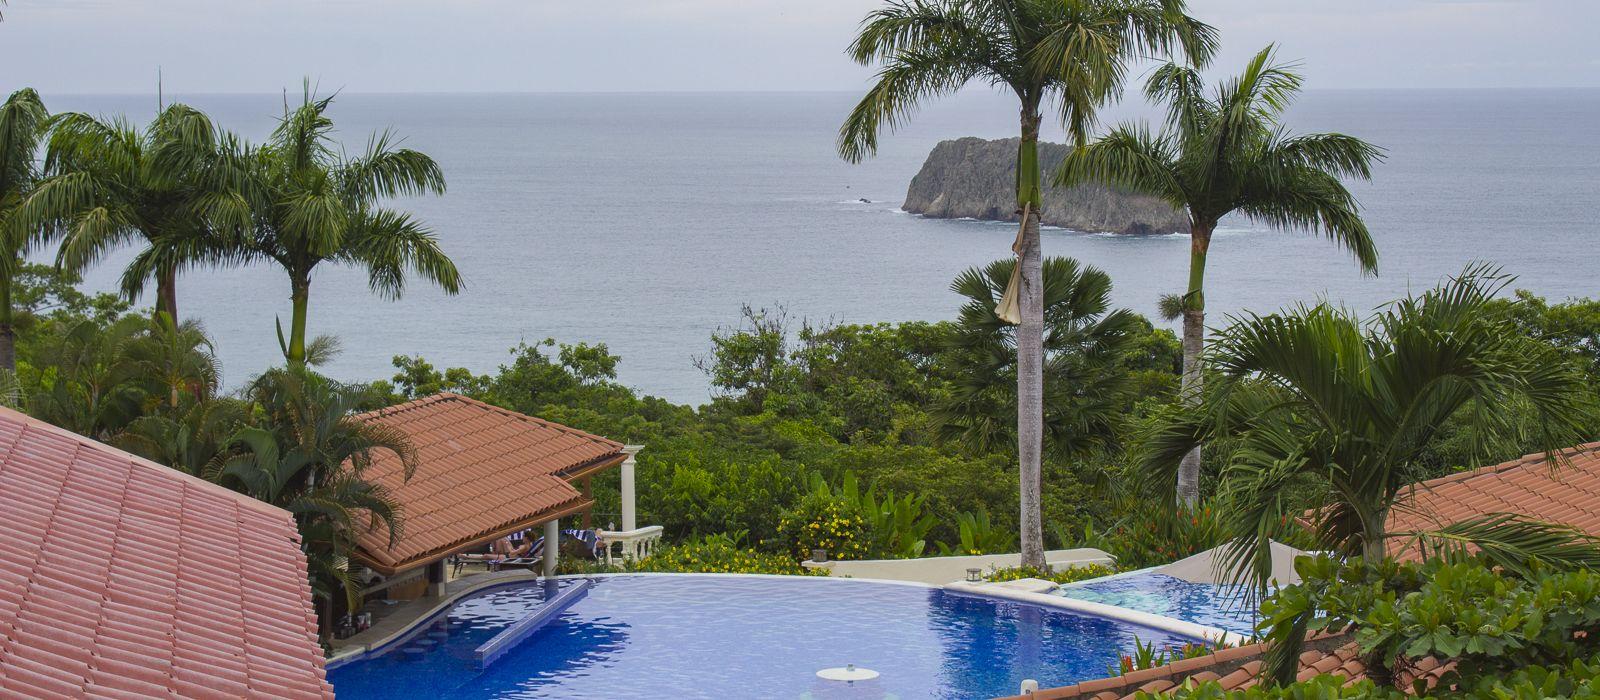 Hotel Parador Resort & Spa Costa Rica